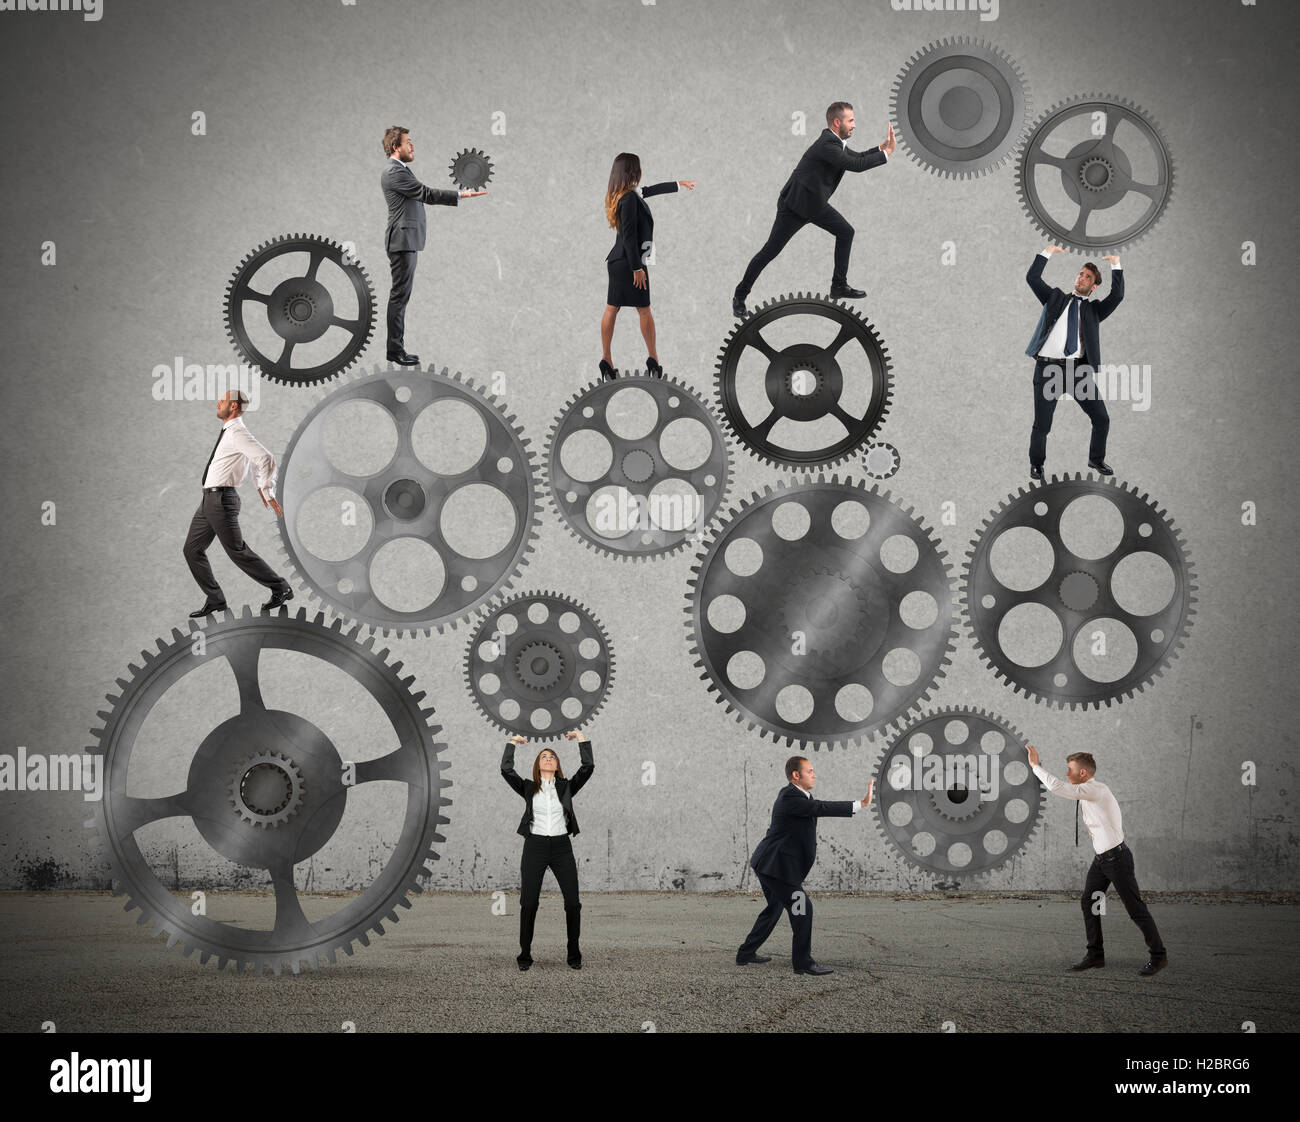 Teamwork of businesspeople - Stock Image